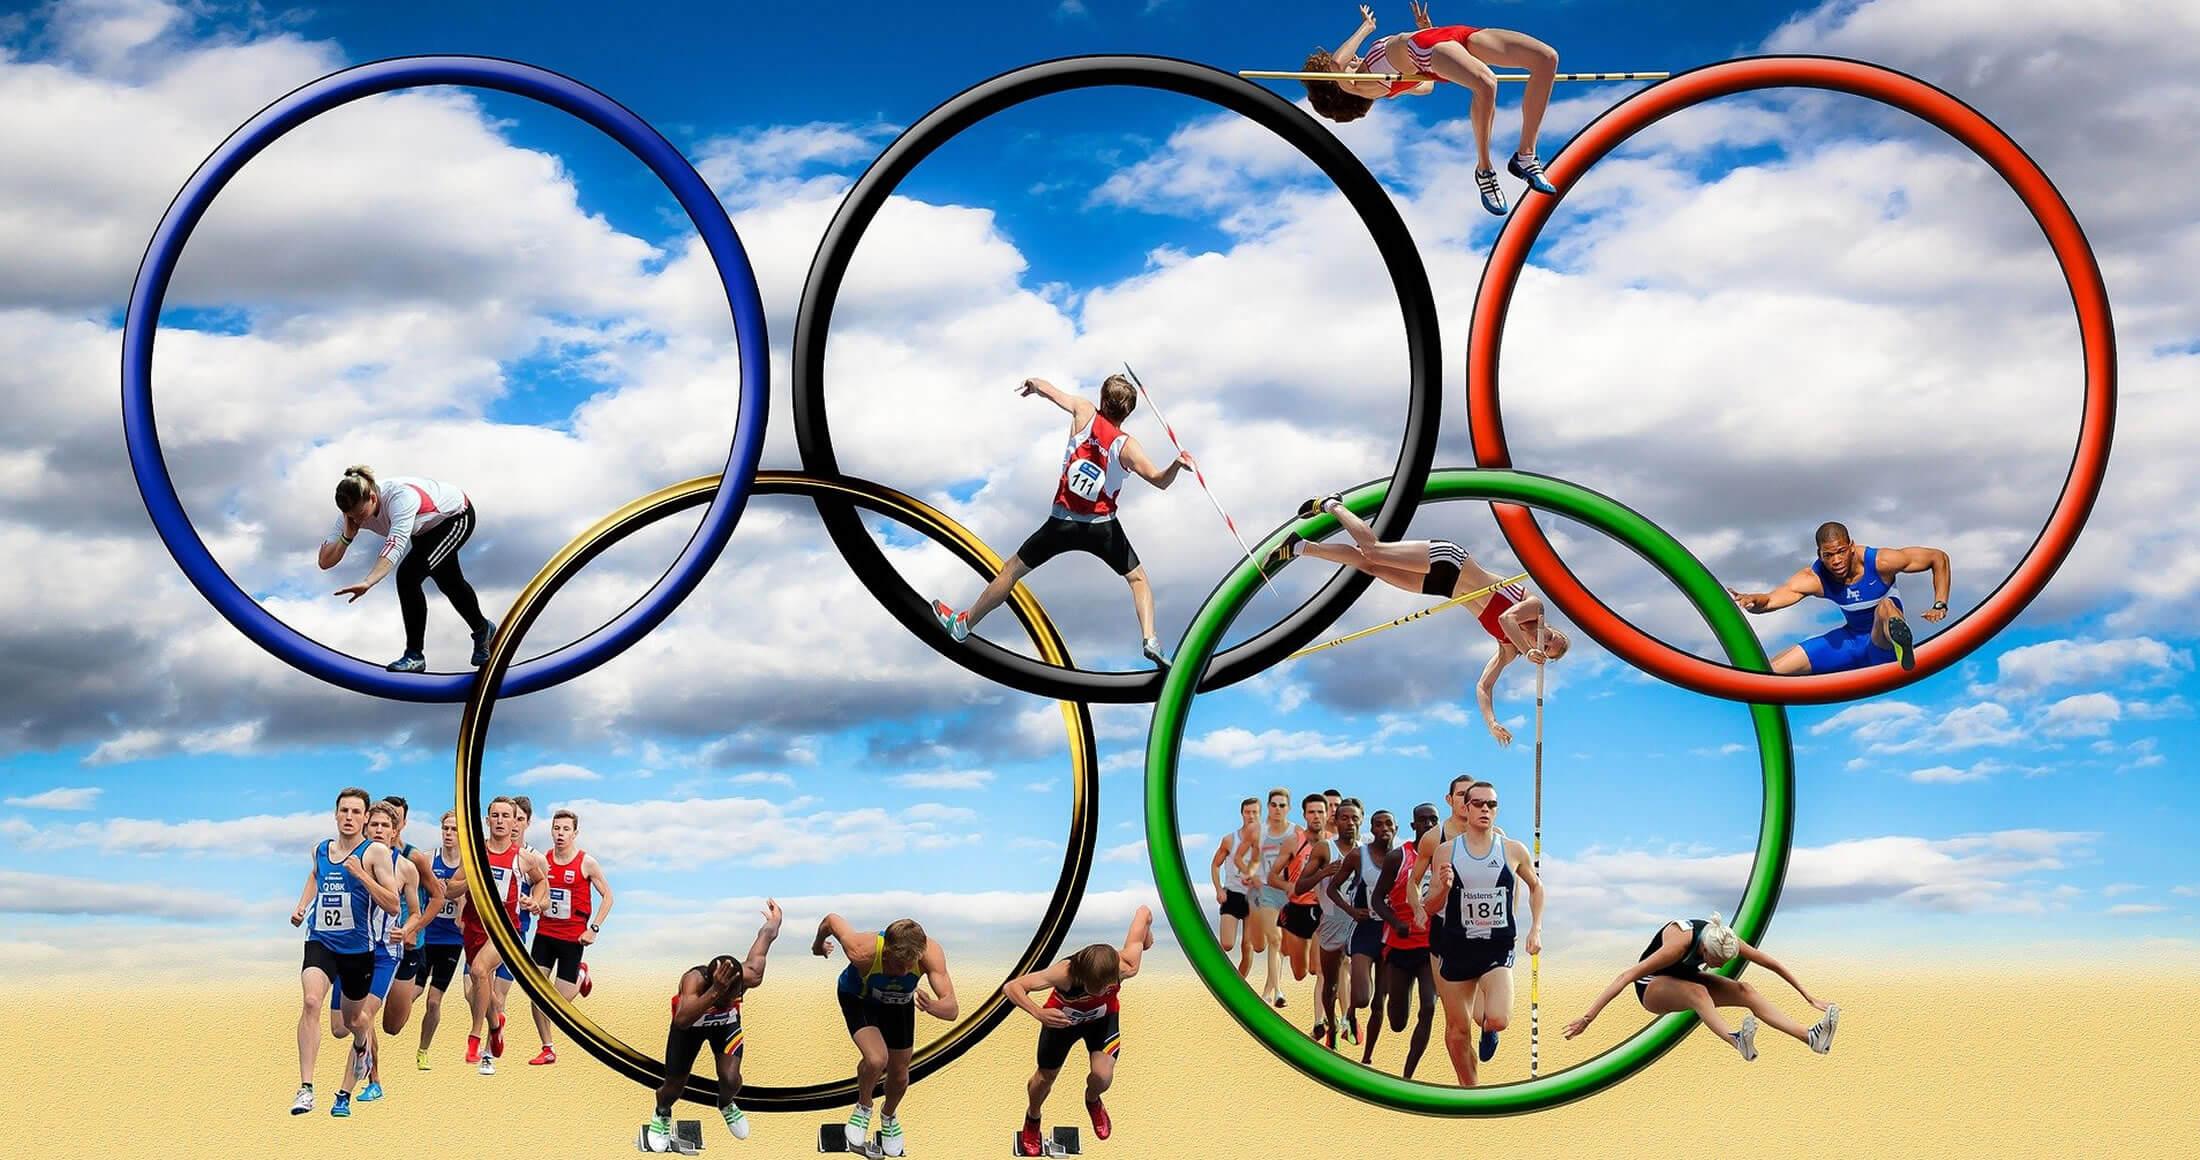 Summer Olympics image